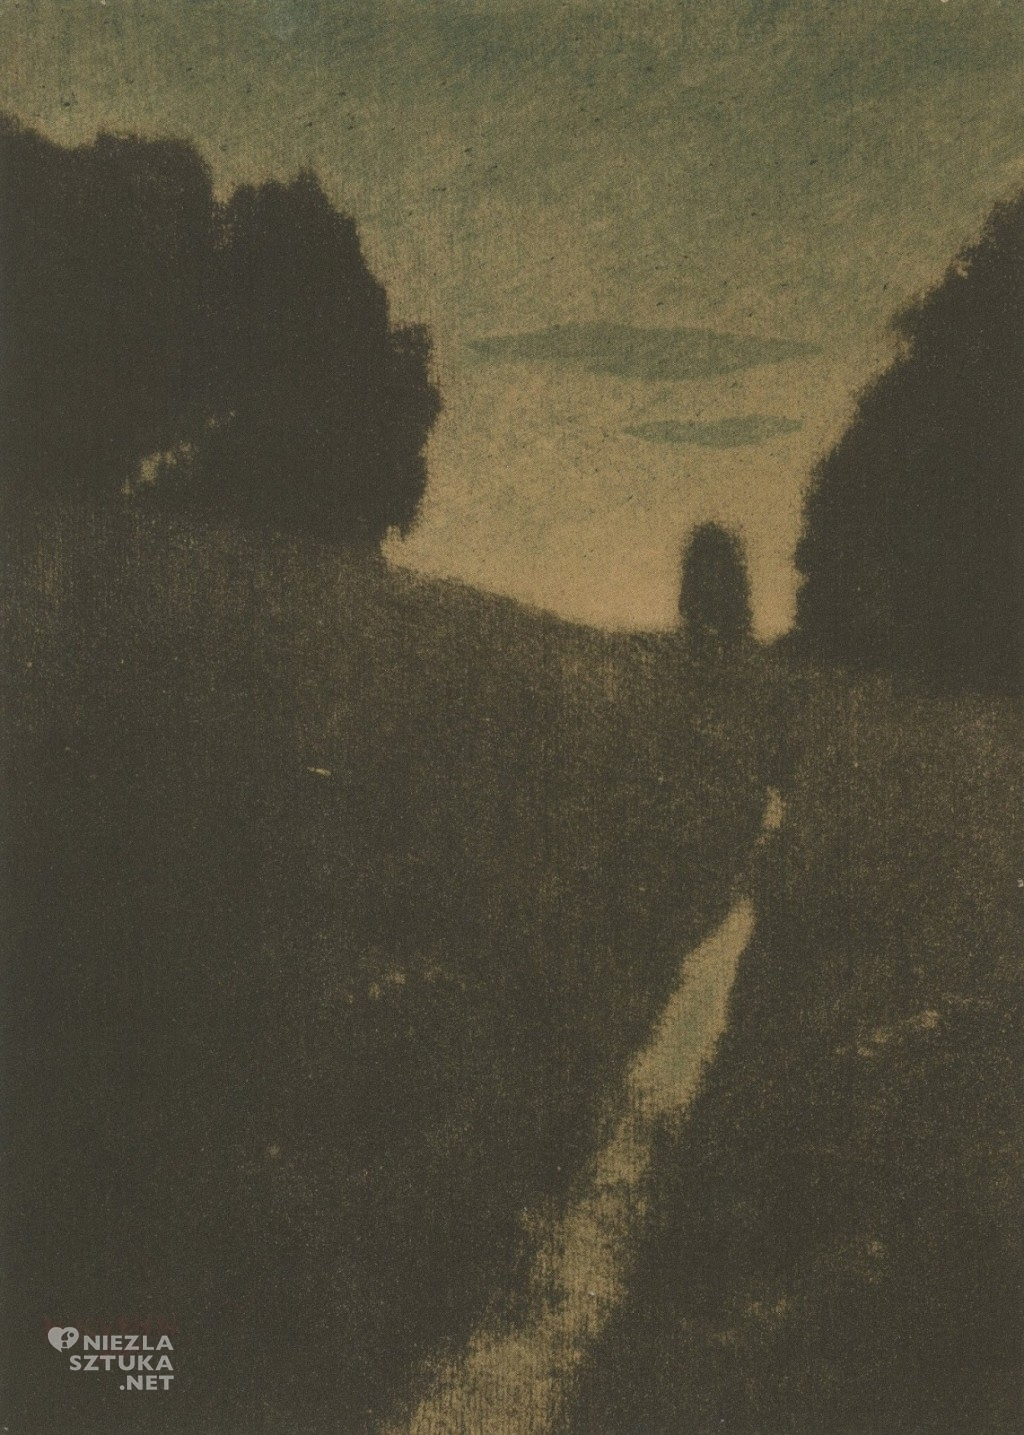 Heinrich Kuehn + Twilight - Dammerung +1898 + bichromate print with watercolor + Albertina Museum - Vienna